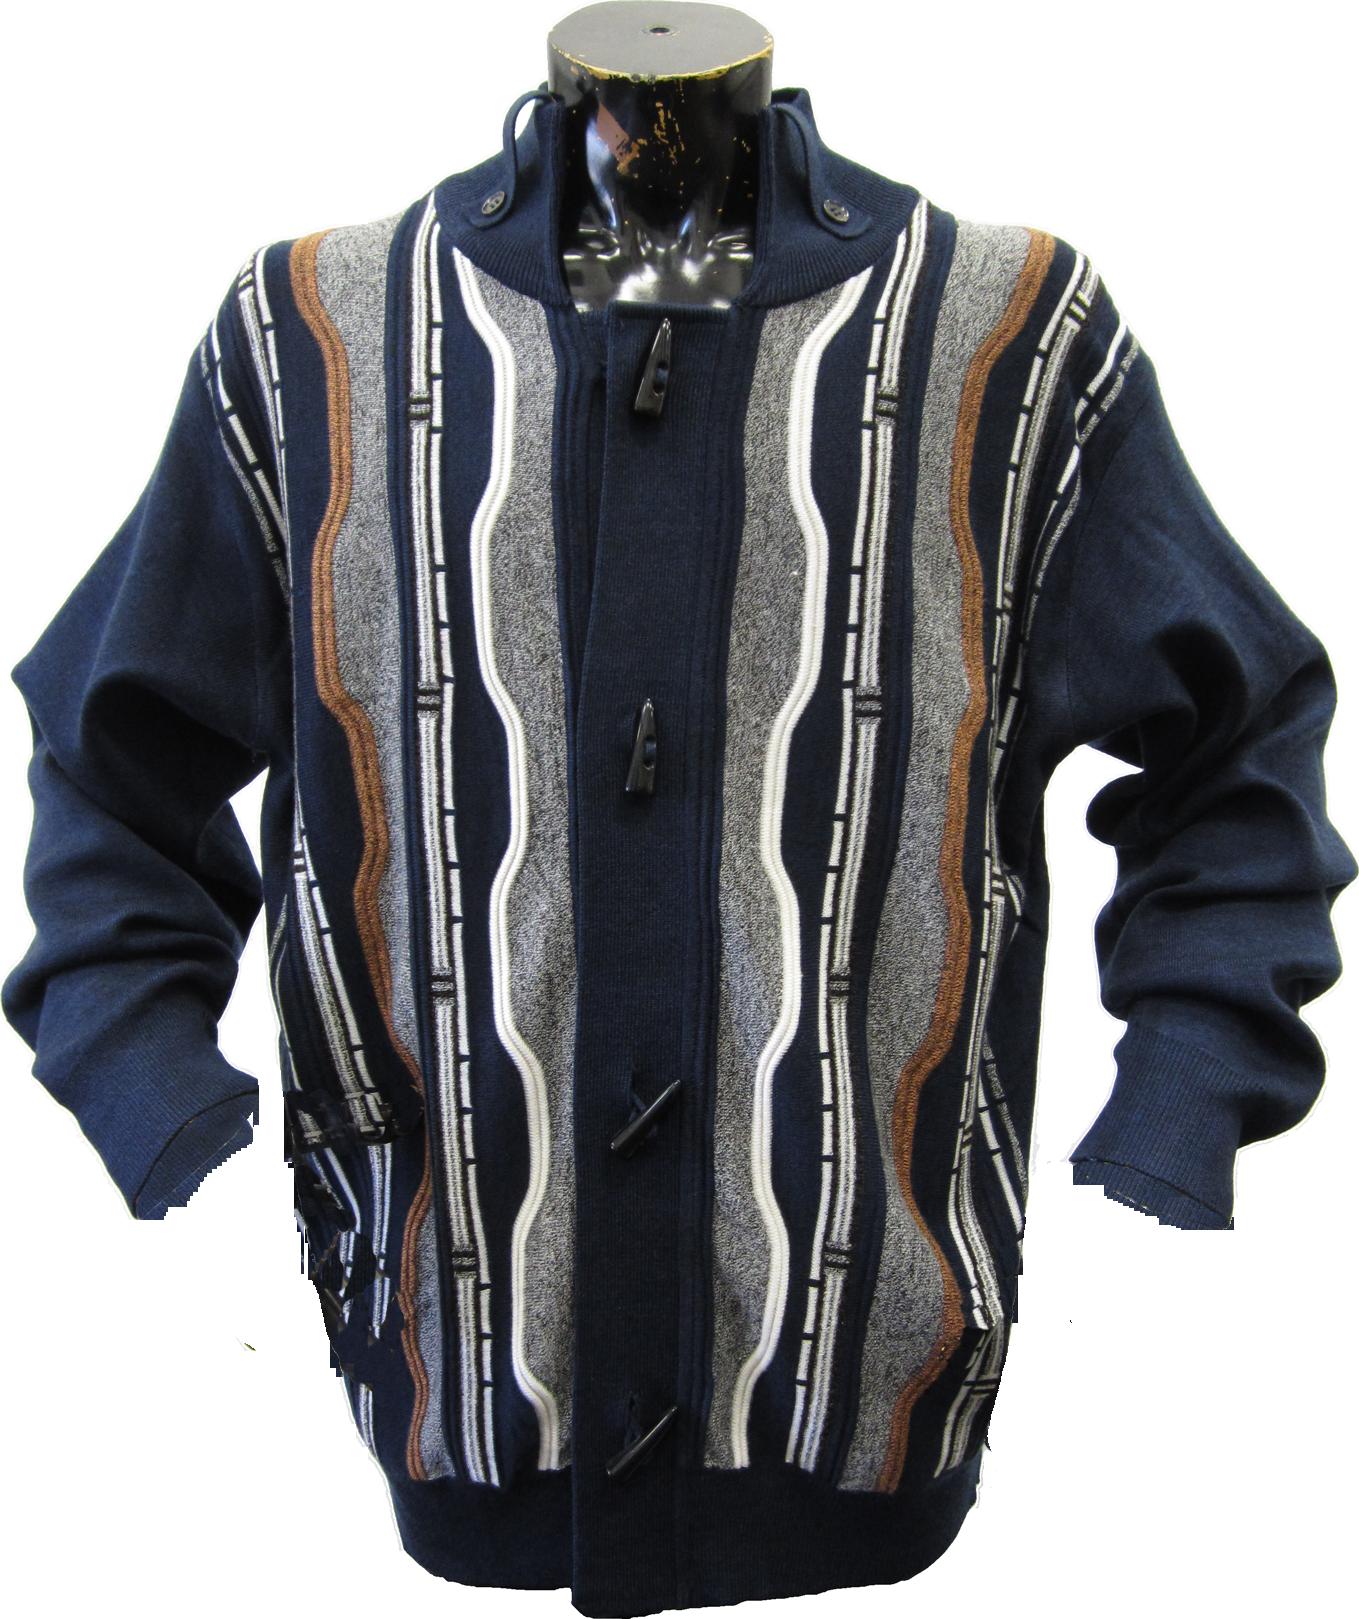 Silversilk Mens Fancy 5 Toggle Sweater Jacket Silversilk Mens